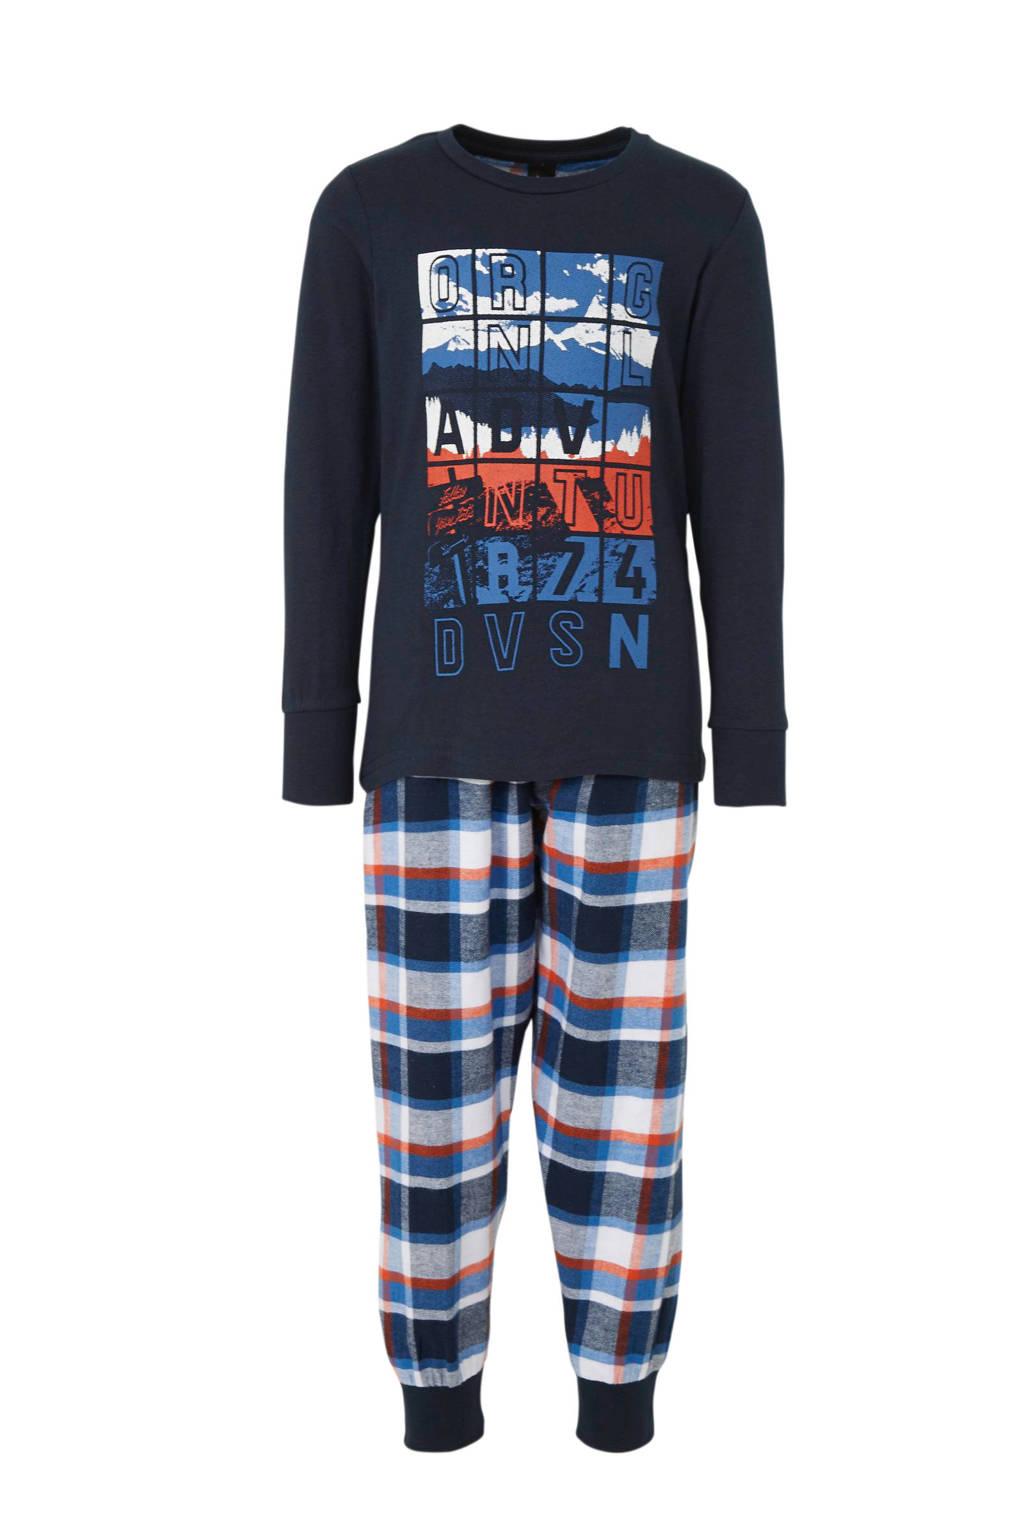 C&A   pyjama printopdruk donkerblauw, Donkerblauw